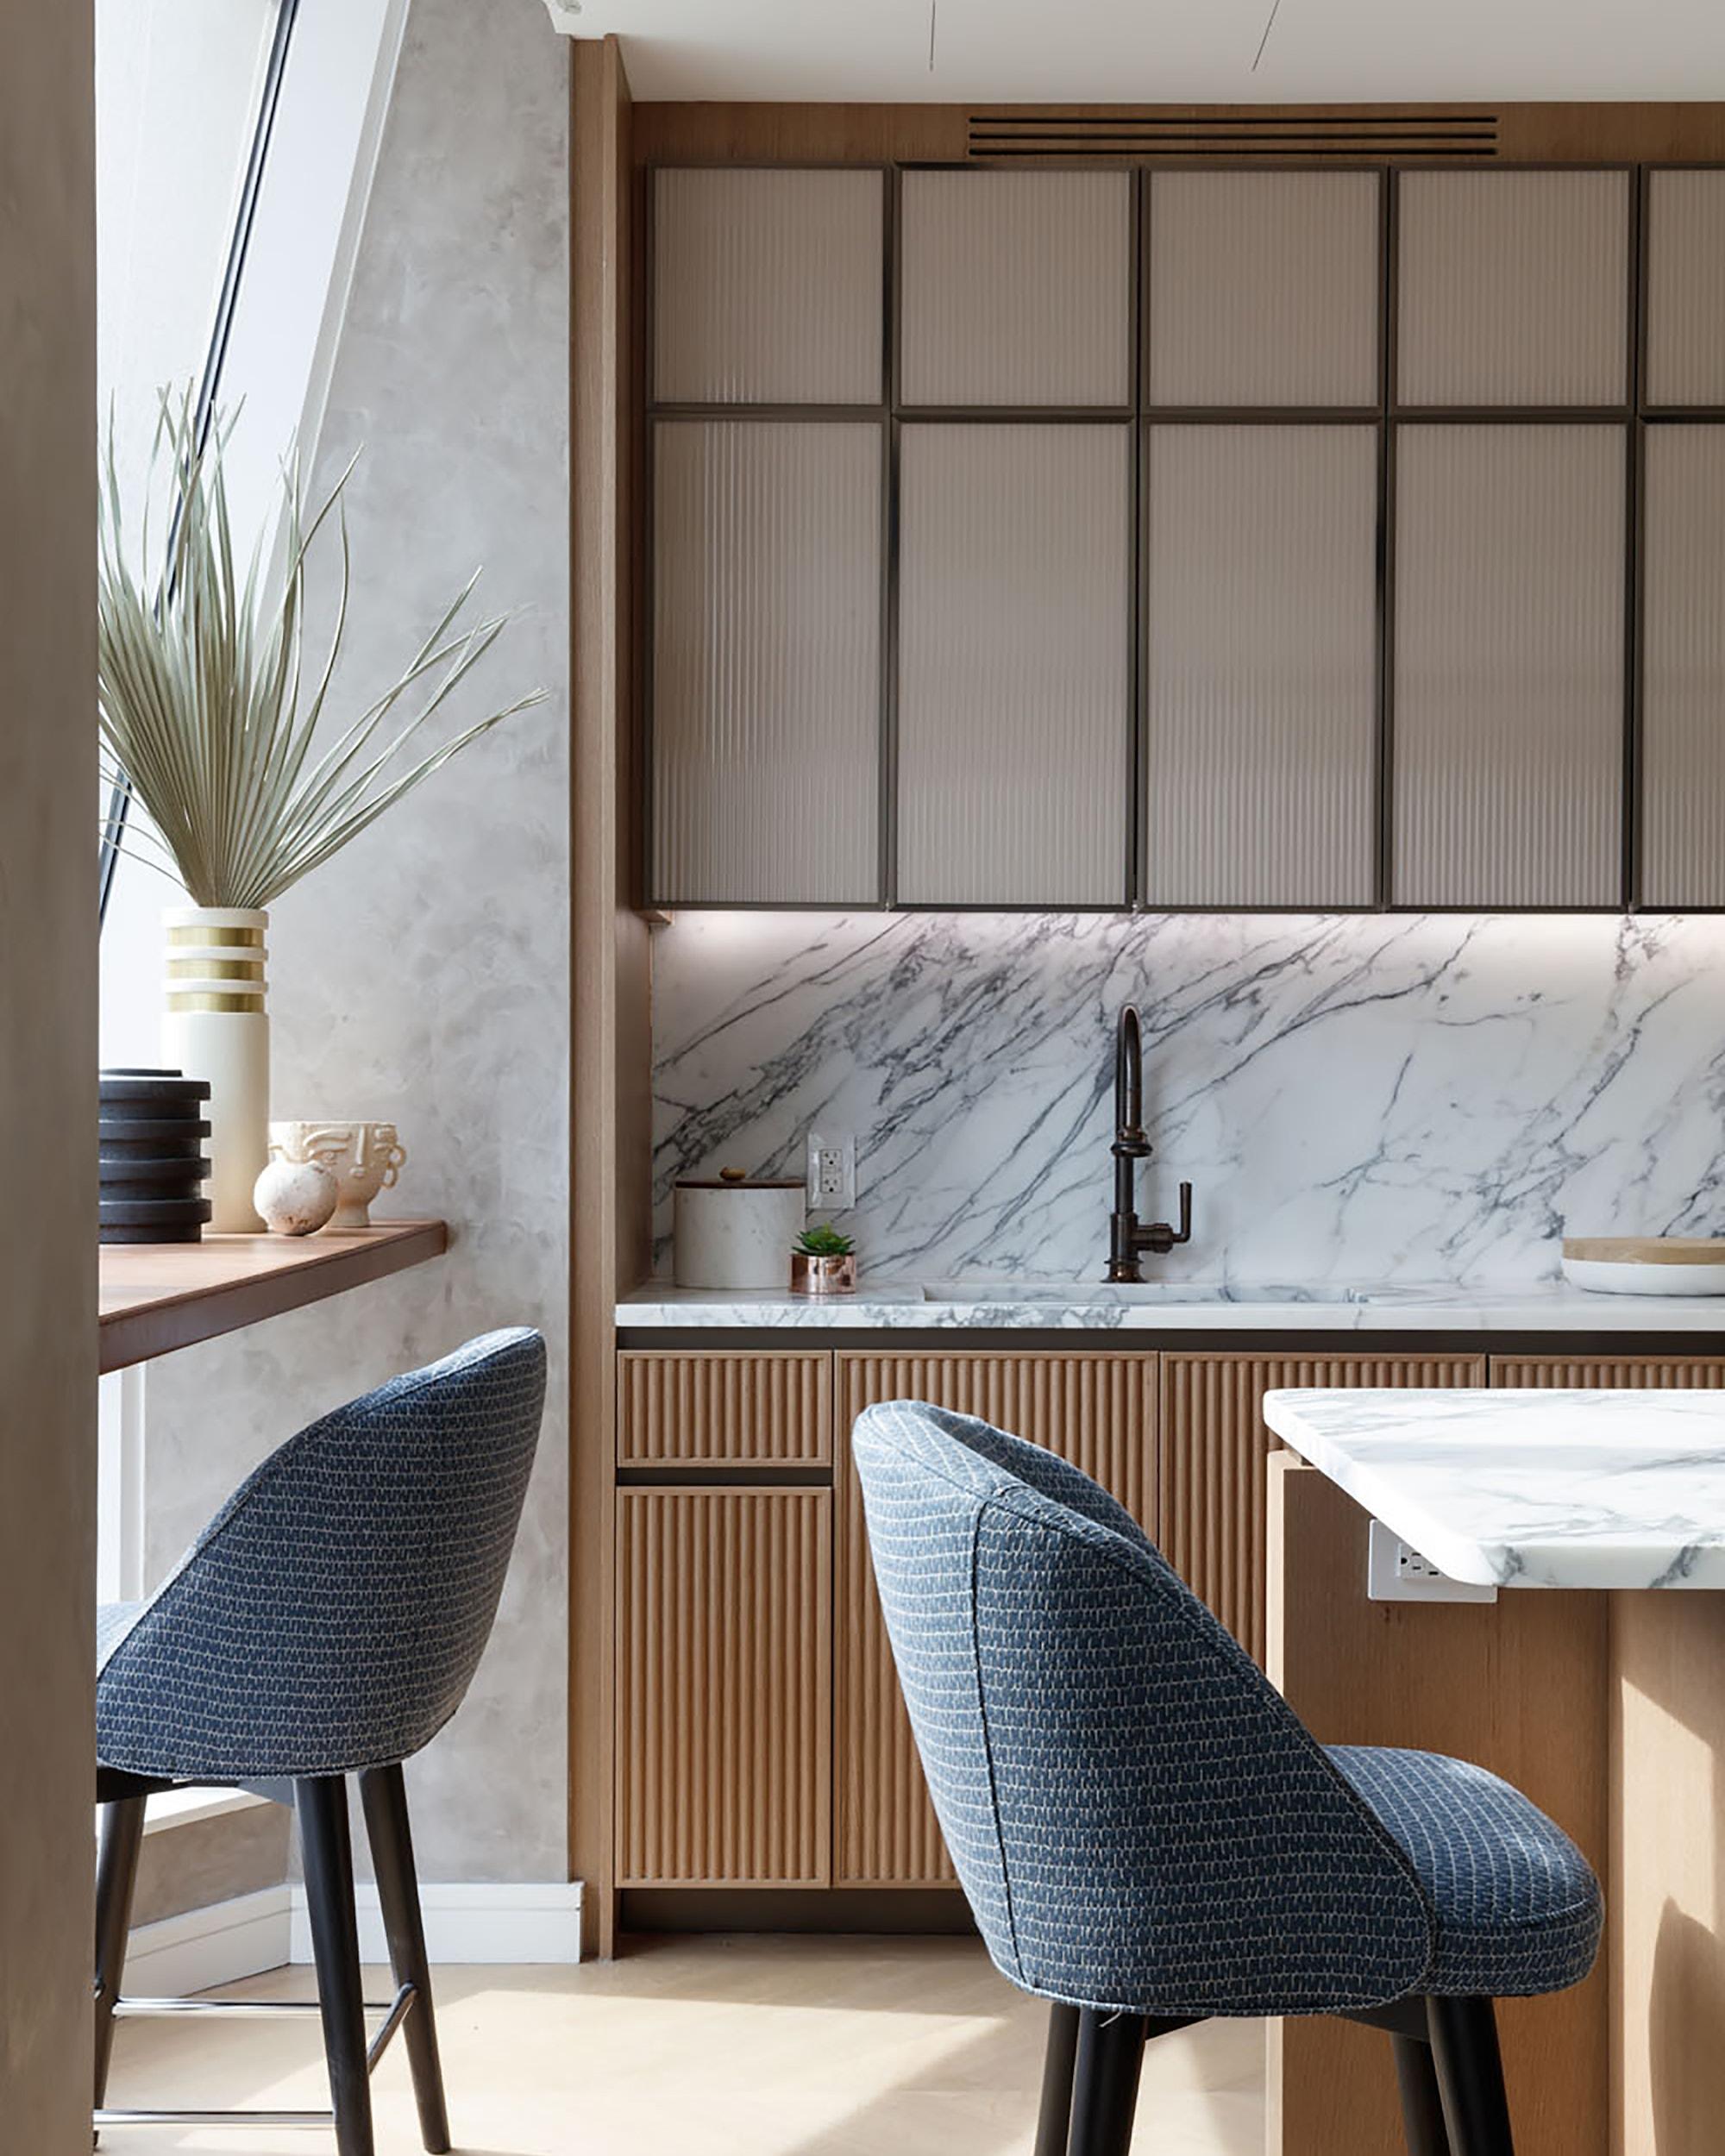 Related-Lantern-House-interior-bar